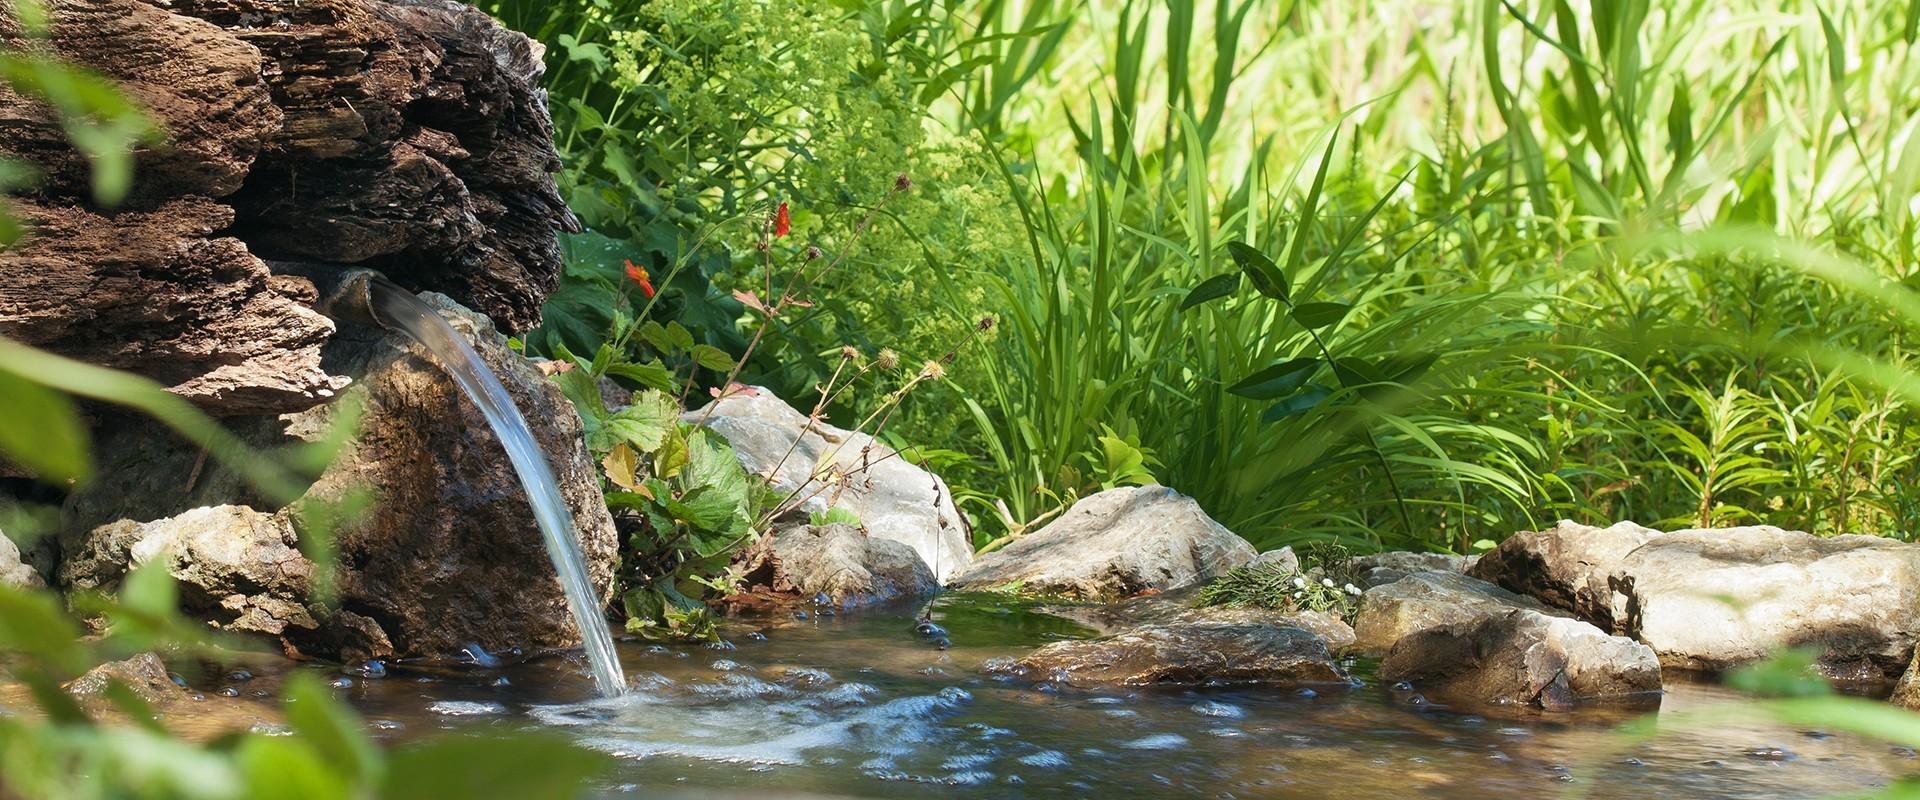 Gartengestaltung christian stingl in wien for Gartengestaltung wien